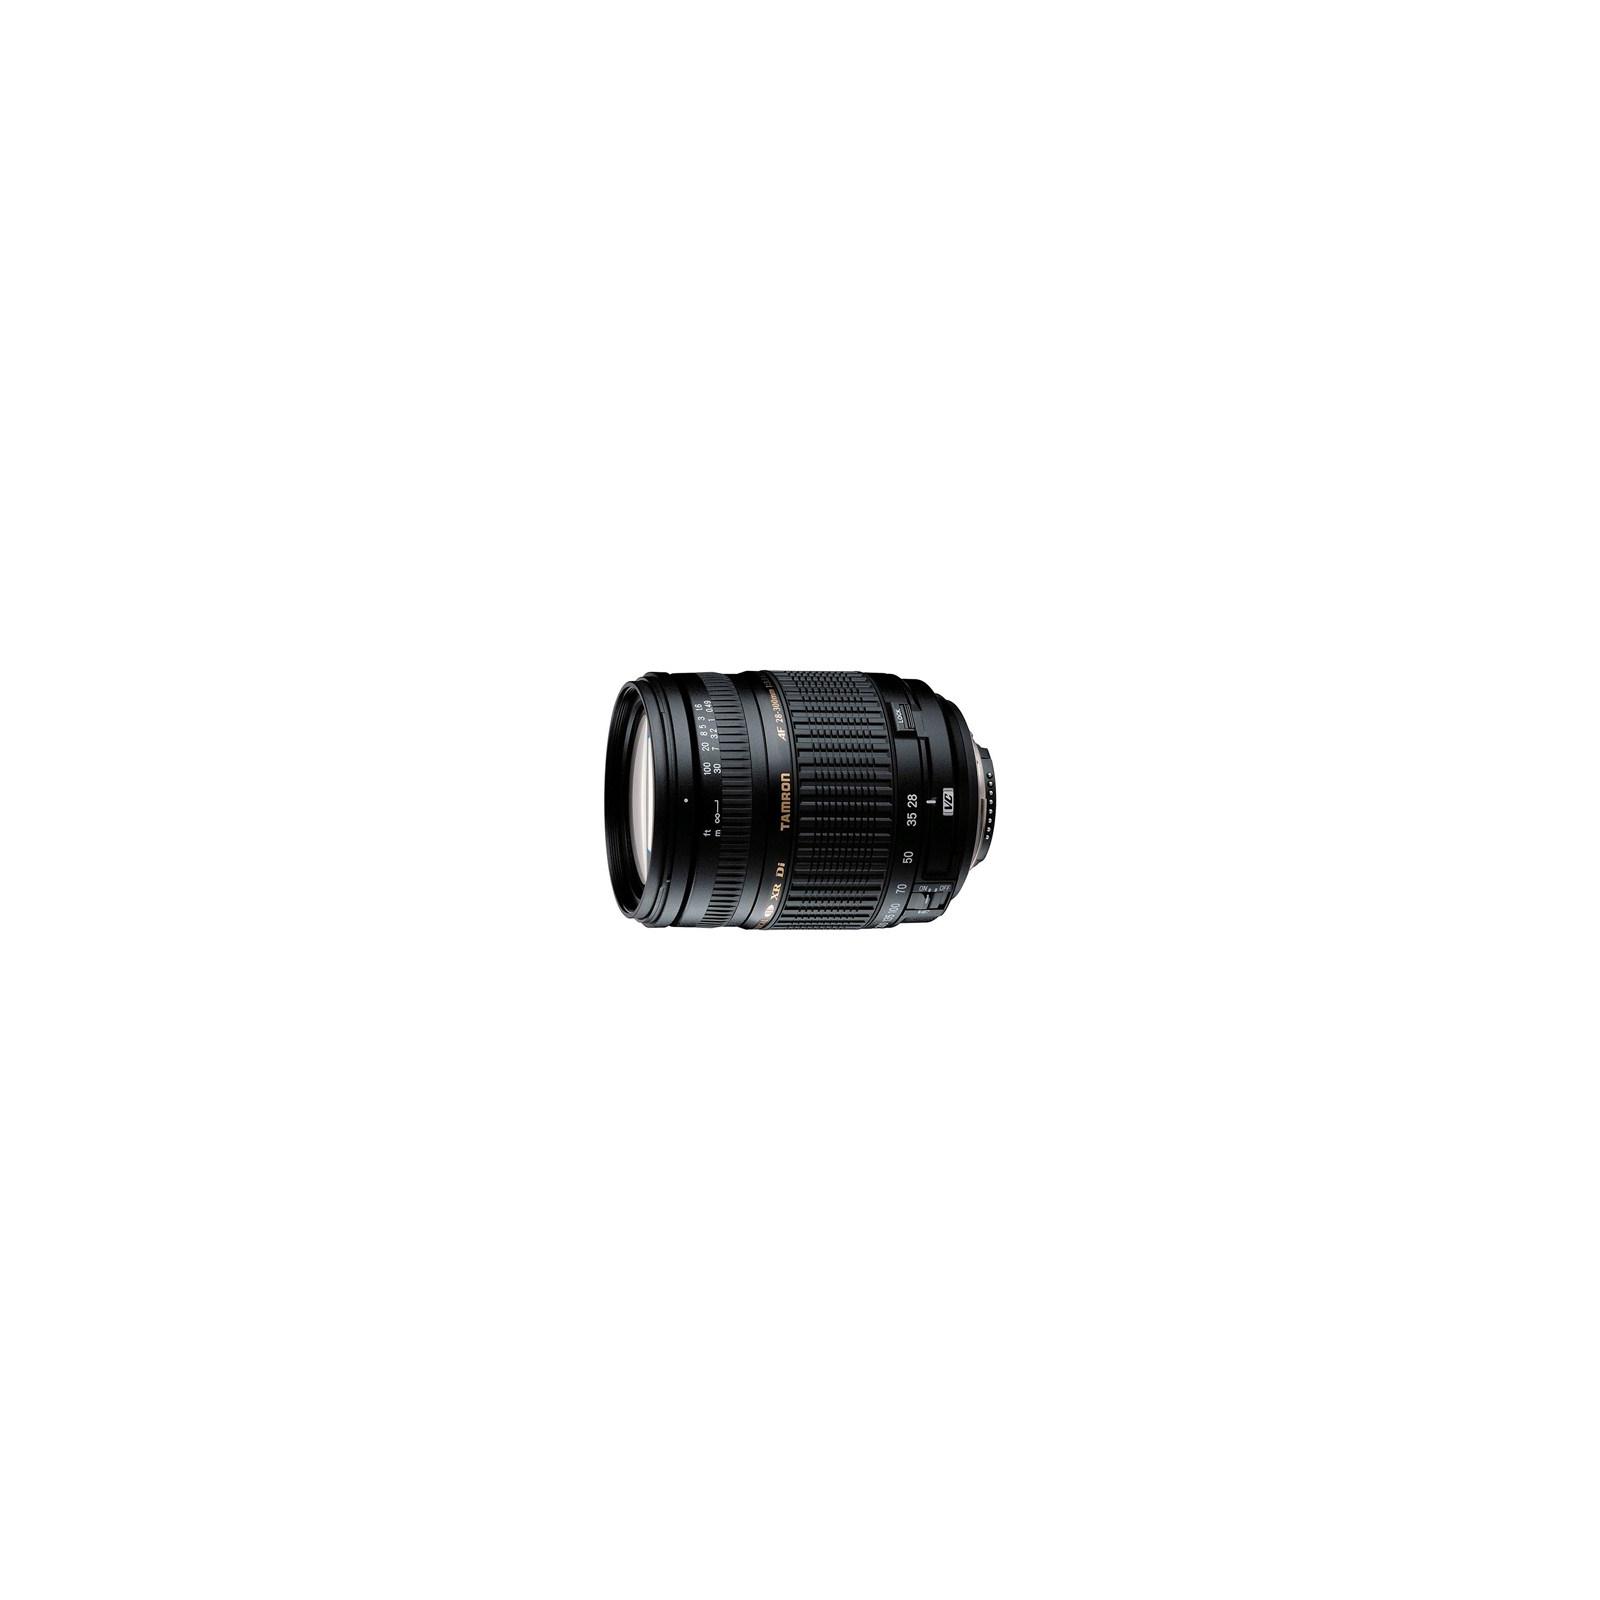 Объектив Tamron AF 28-300mm f/3.5-6.3 XR Di VC LD Asp. (IF) macro for Nikon (AF 28-300mm for Nikon)